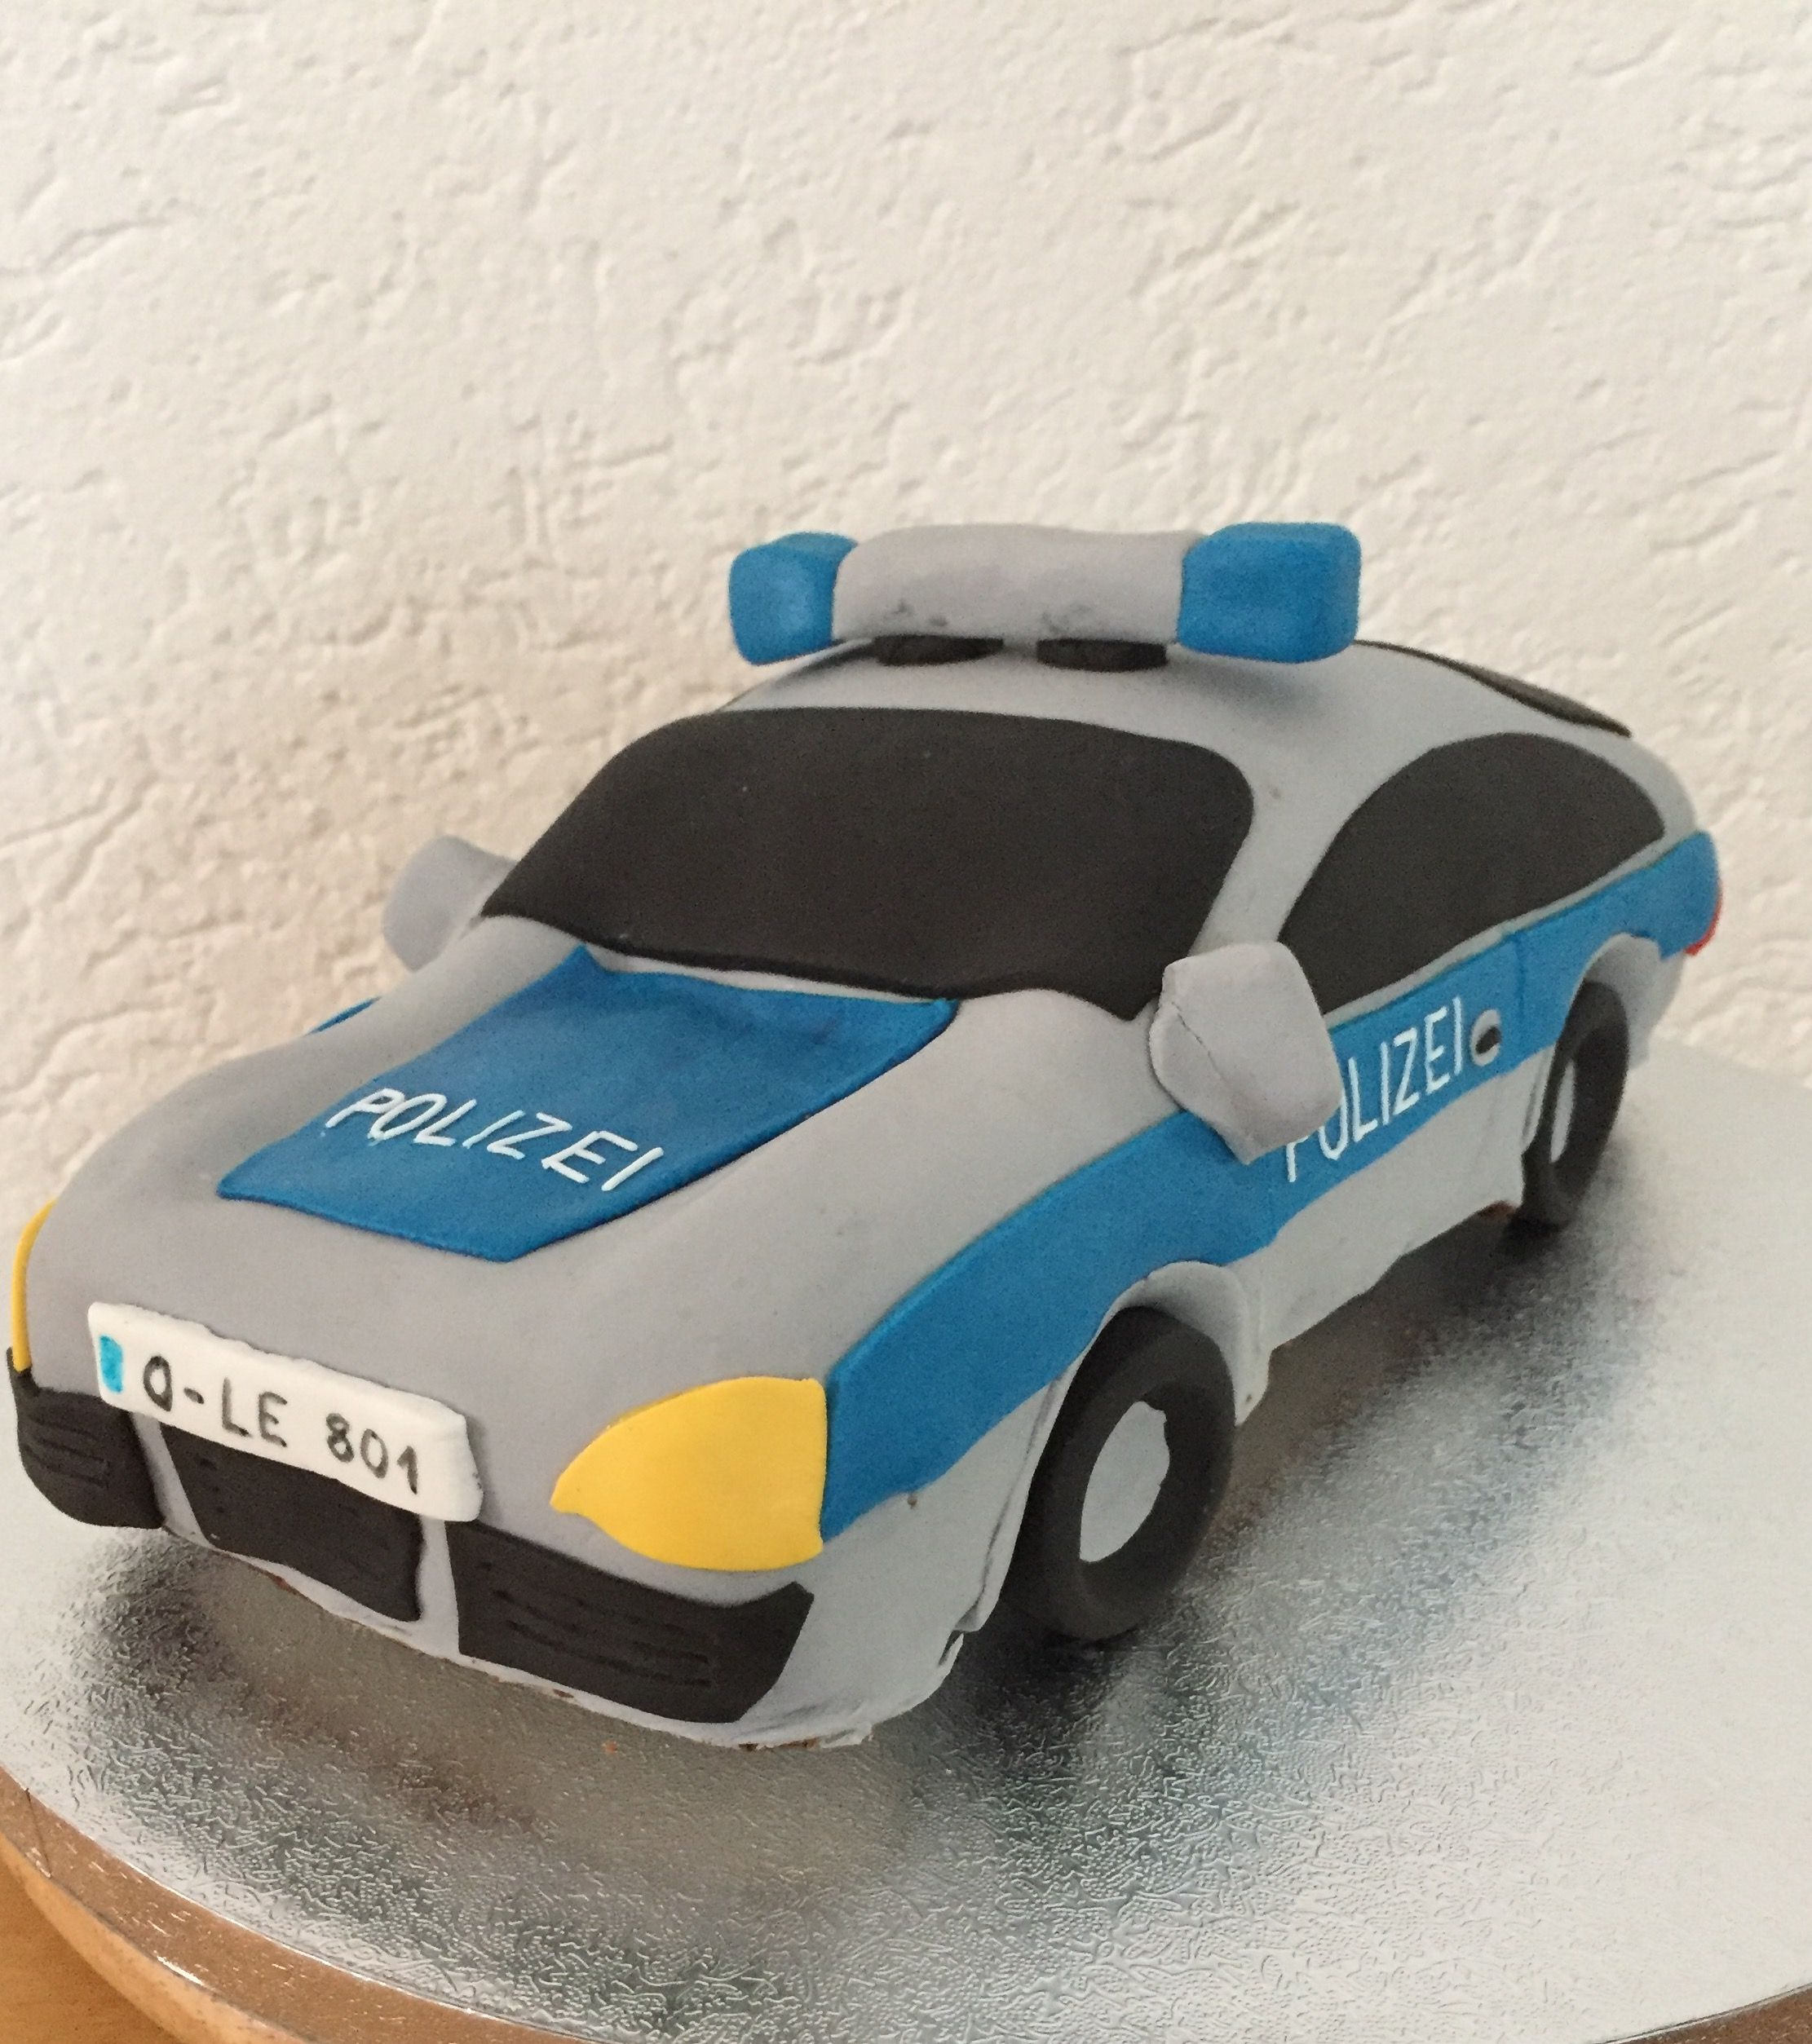 Pin By Samp Laster On Carros: Polizeiauto Kuchen